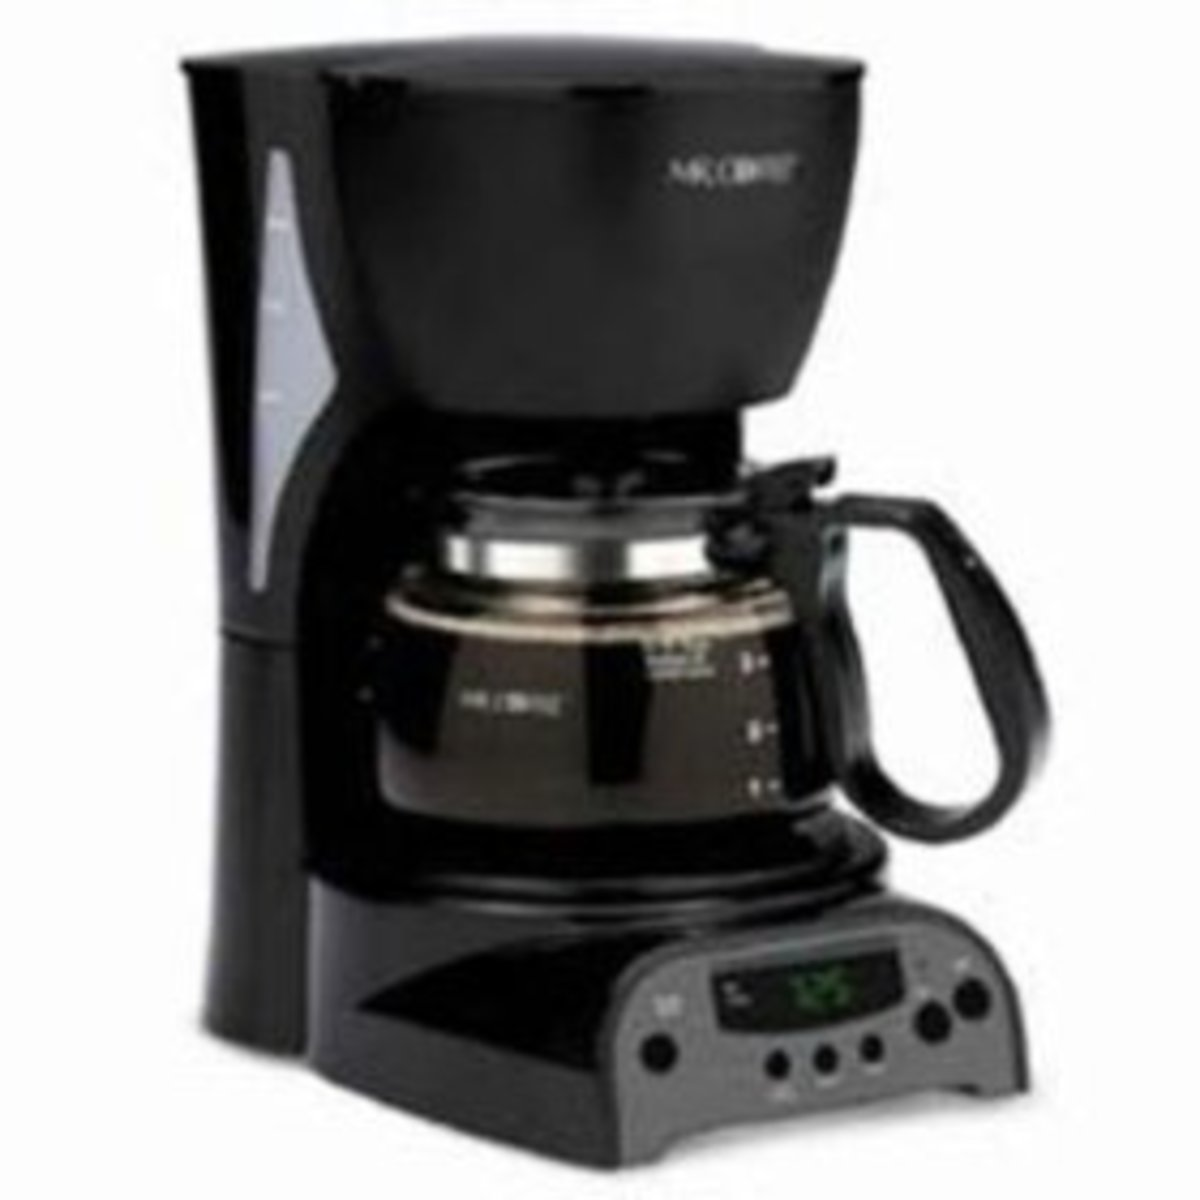 Mr. Coffee Programmable Coffeemaker